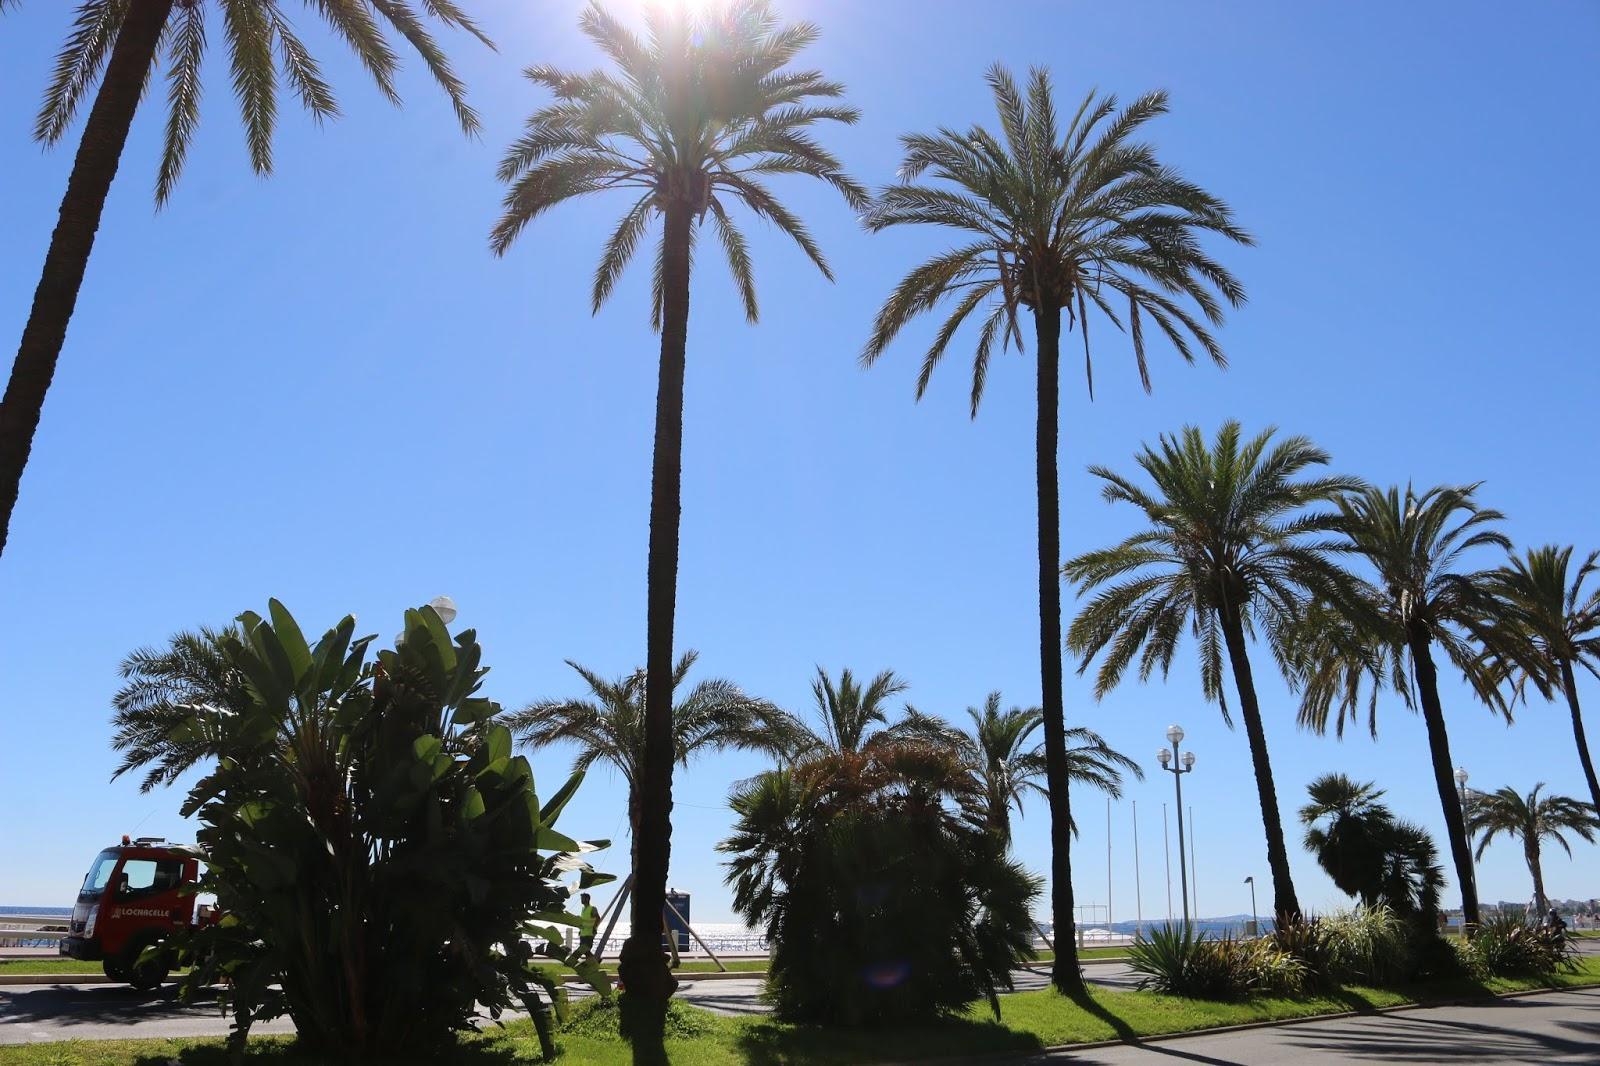 Nice Palm Trees